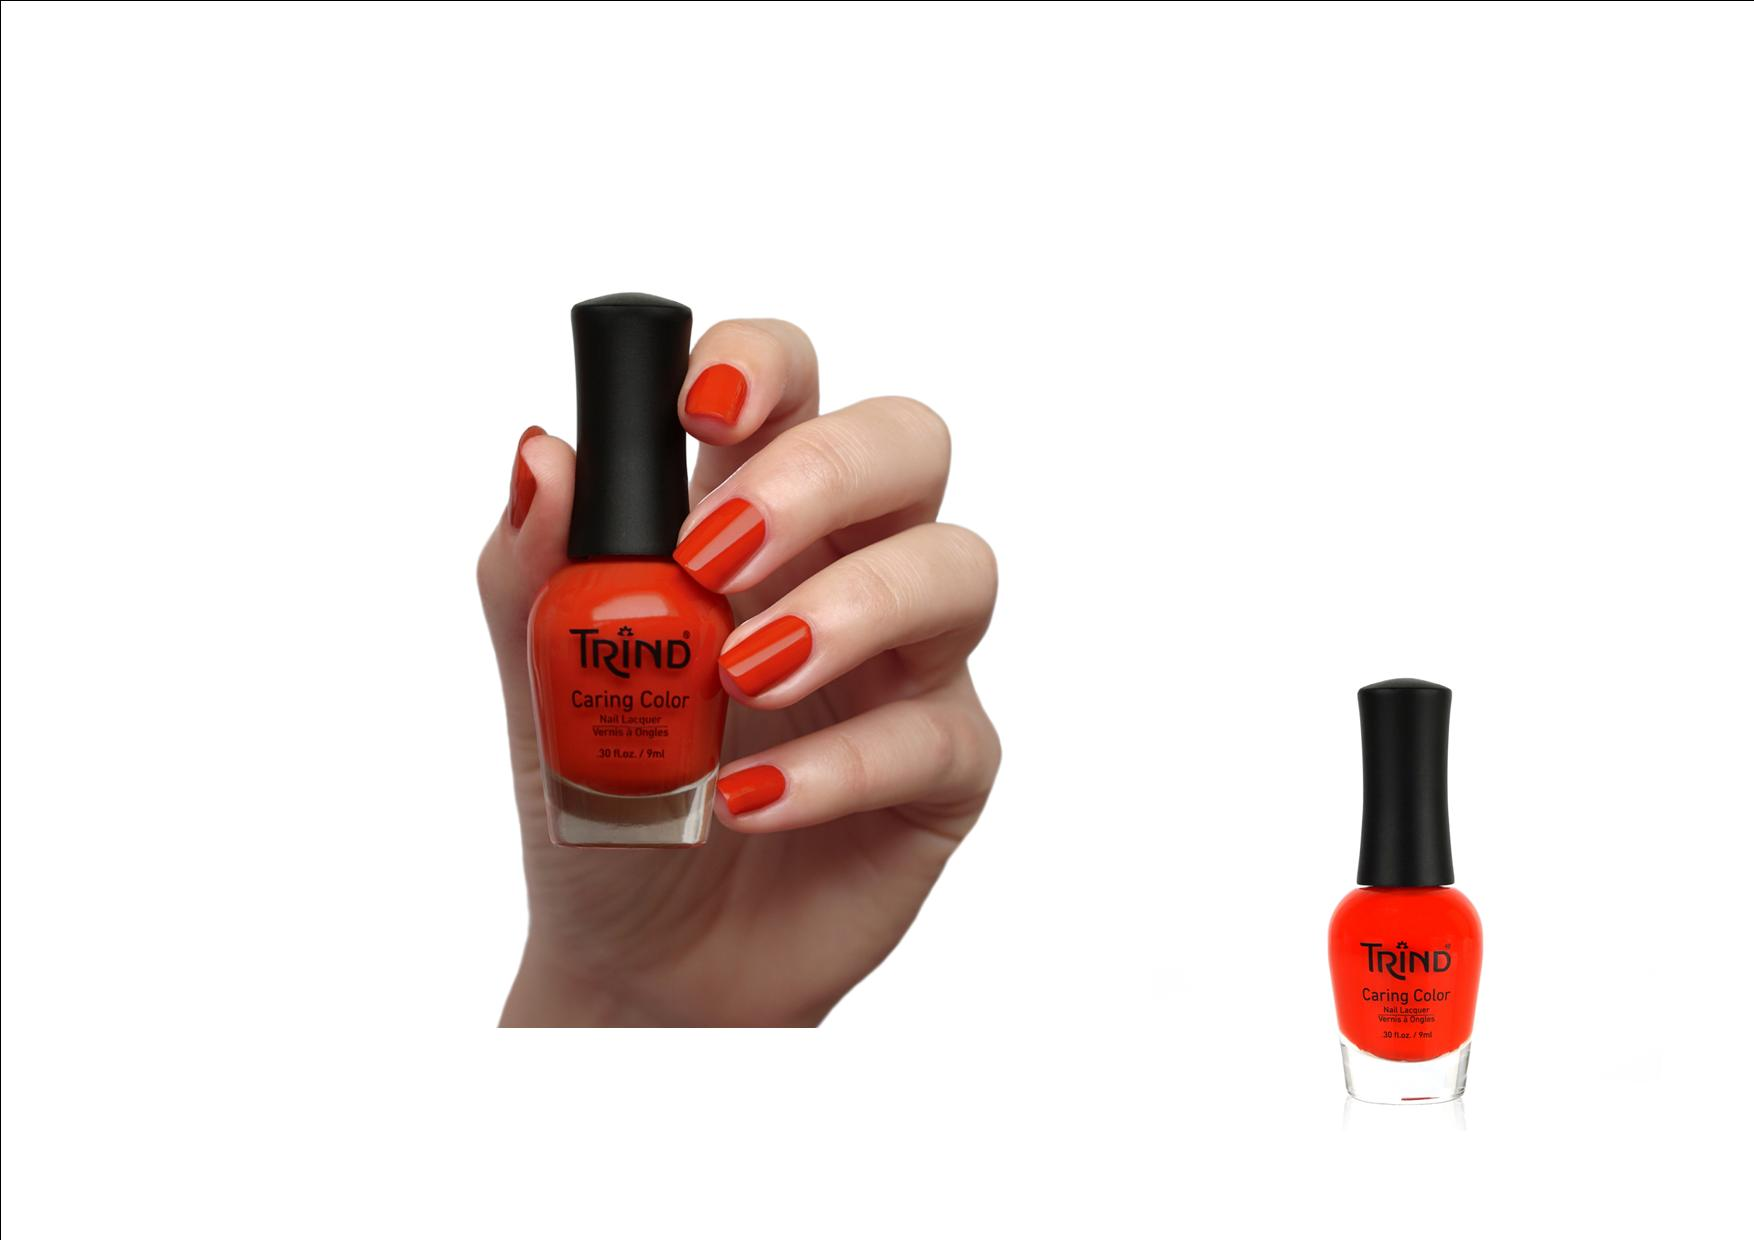 Trind Caring Color Nagellak 270 Pumpkin Spice